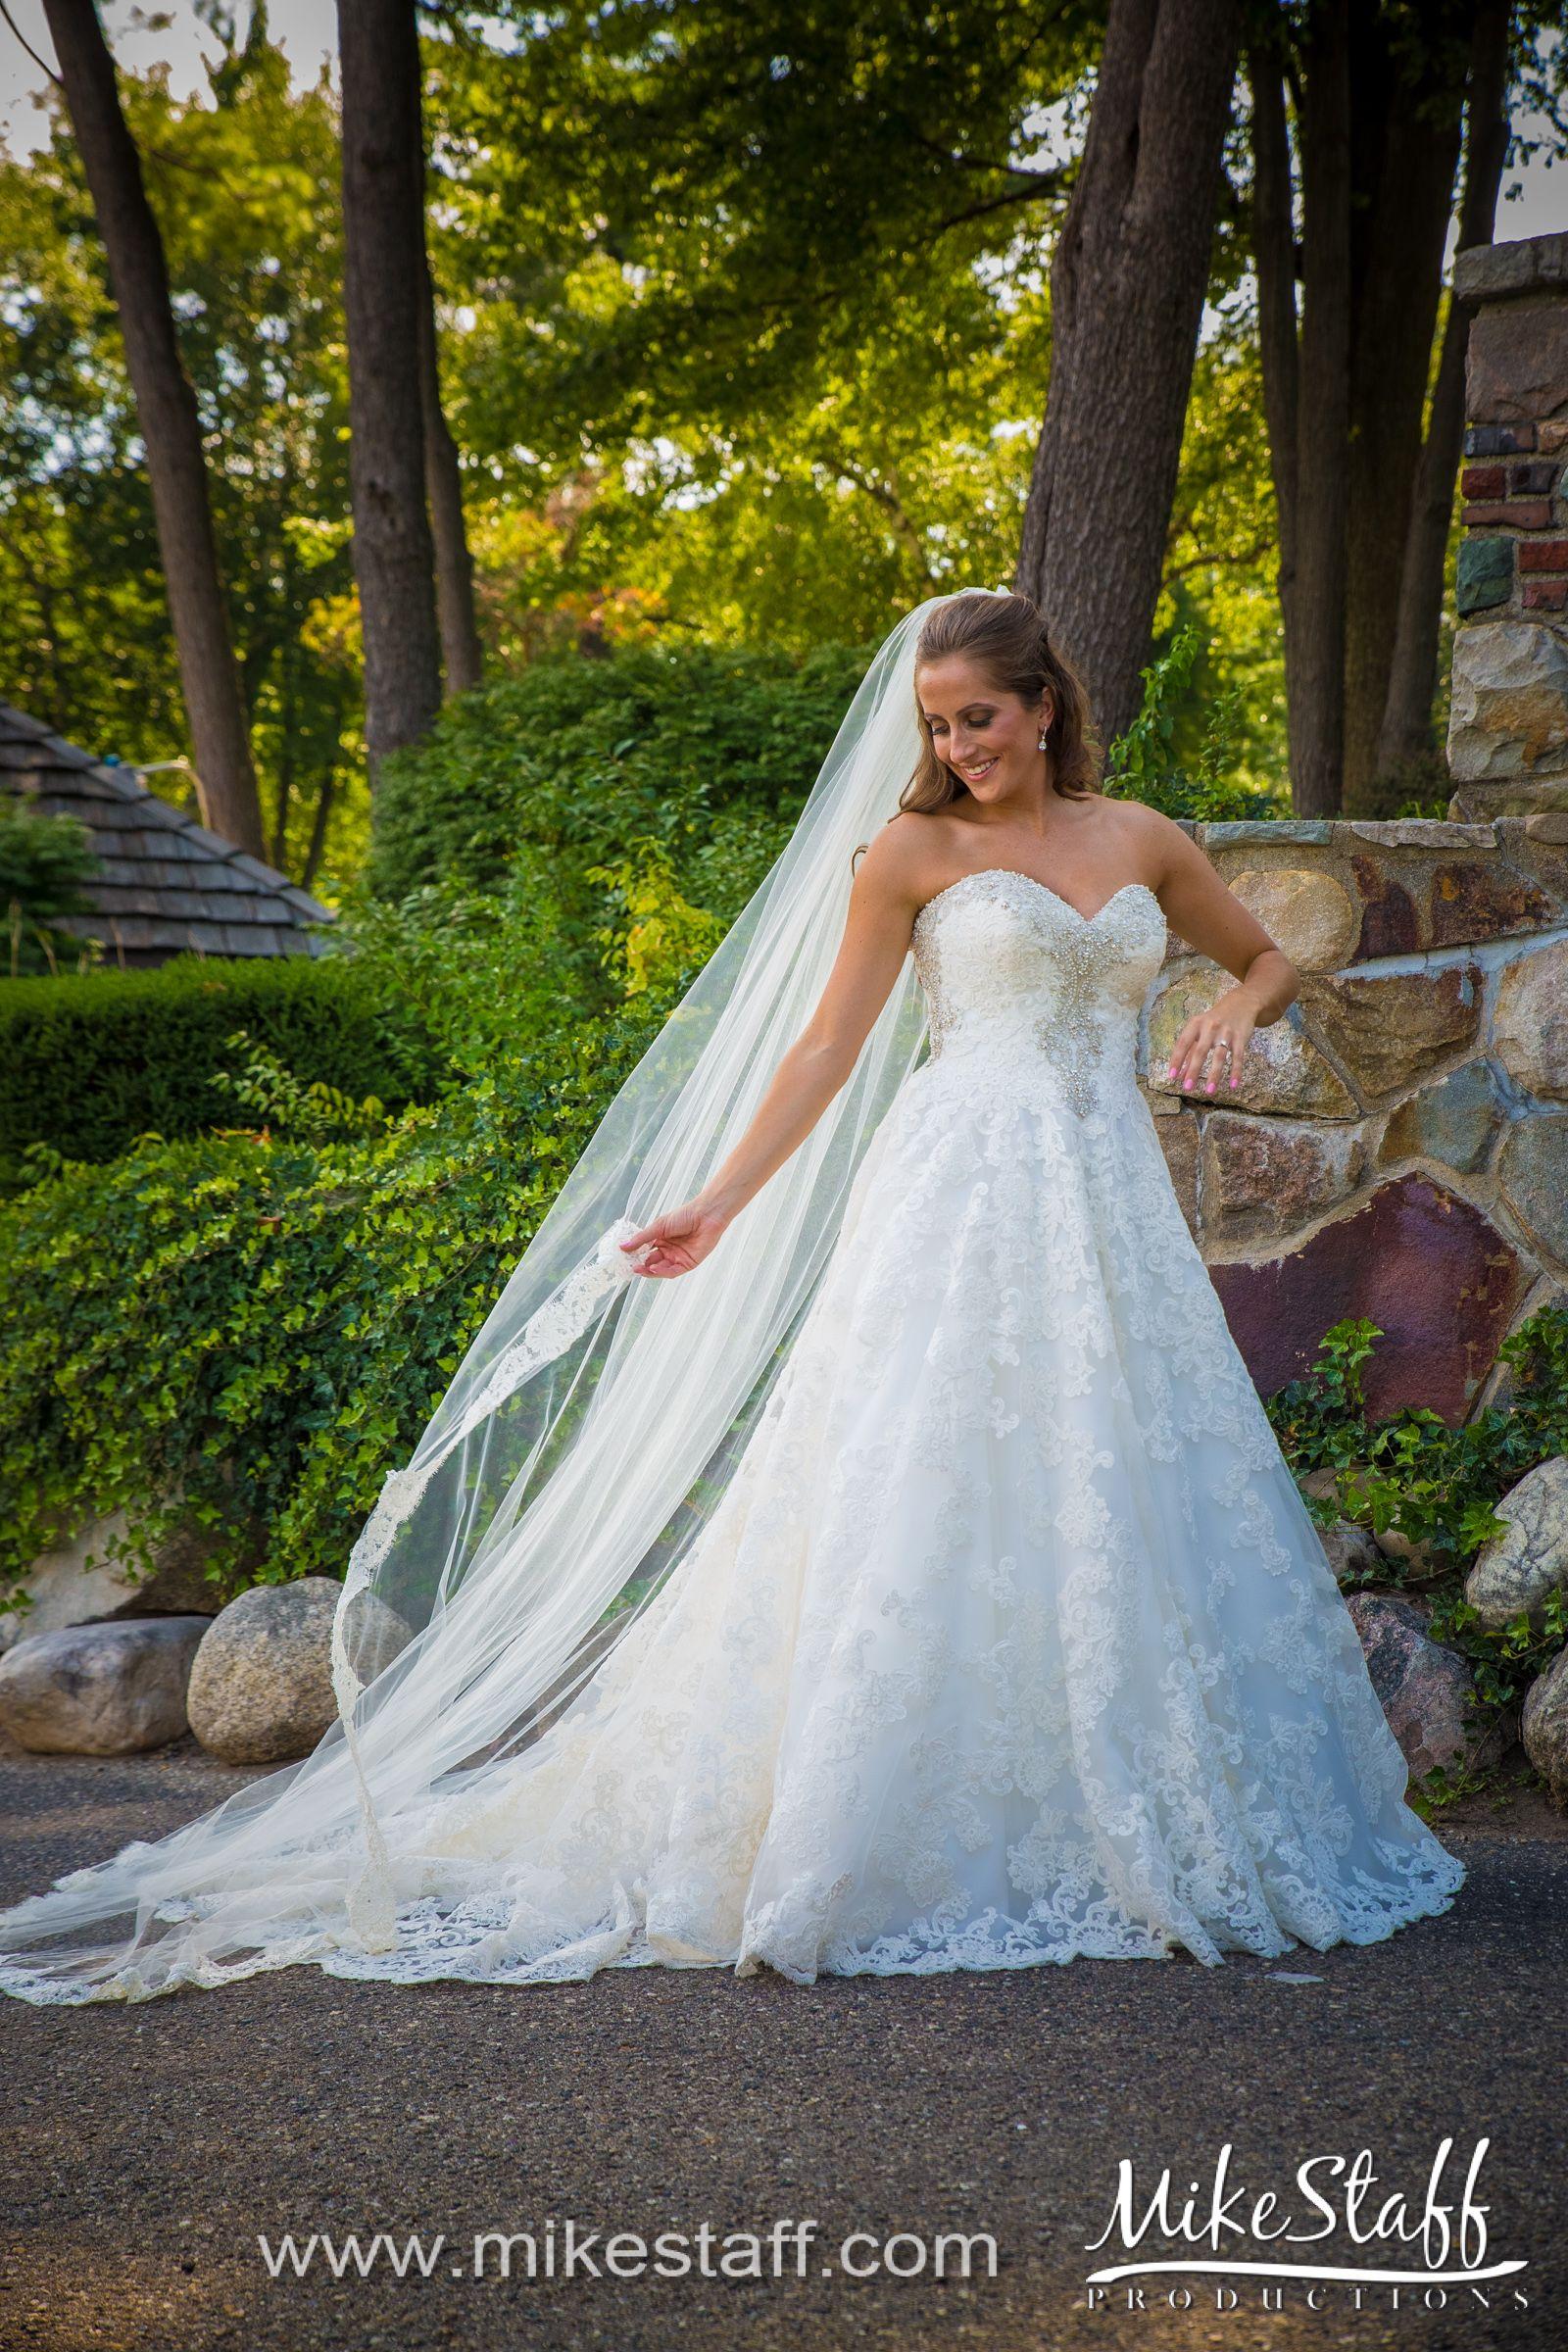 Wedding photographers in metro detroit idea plans wedding